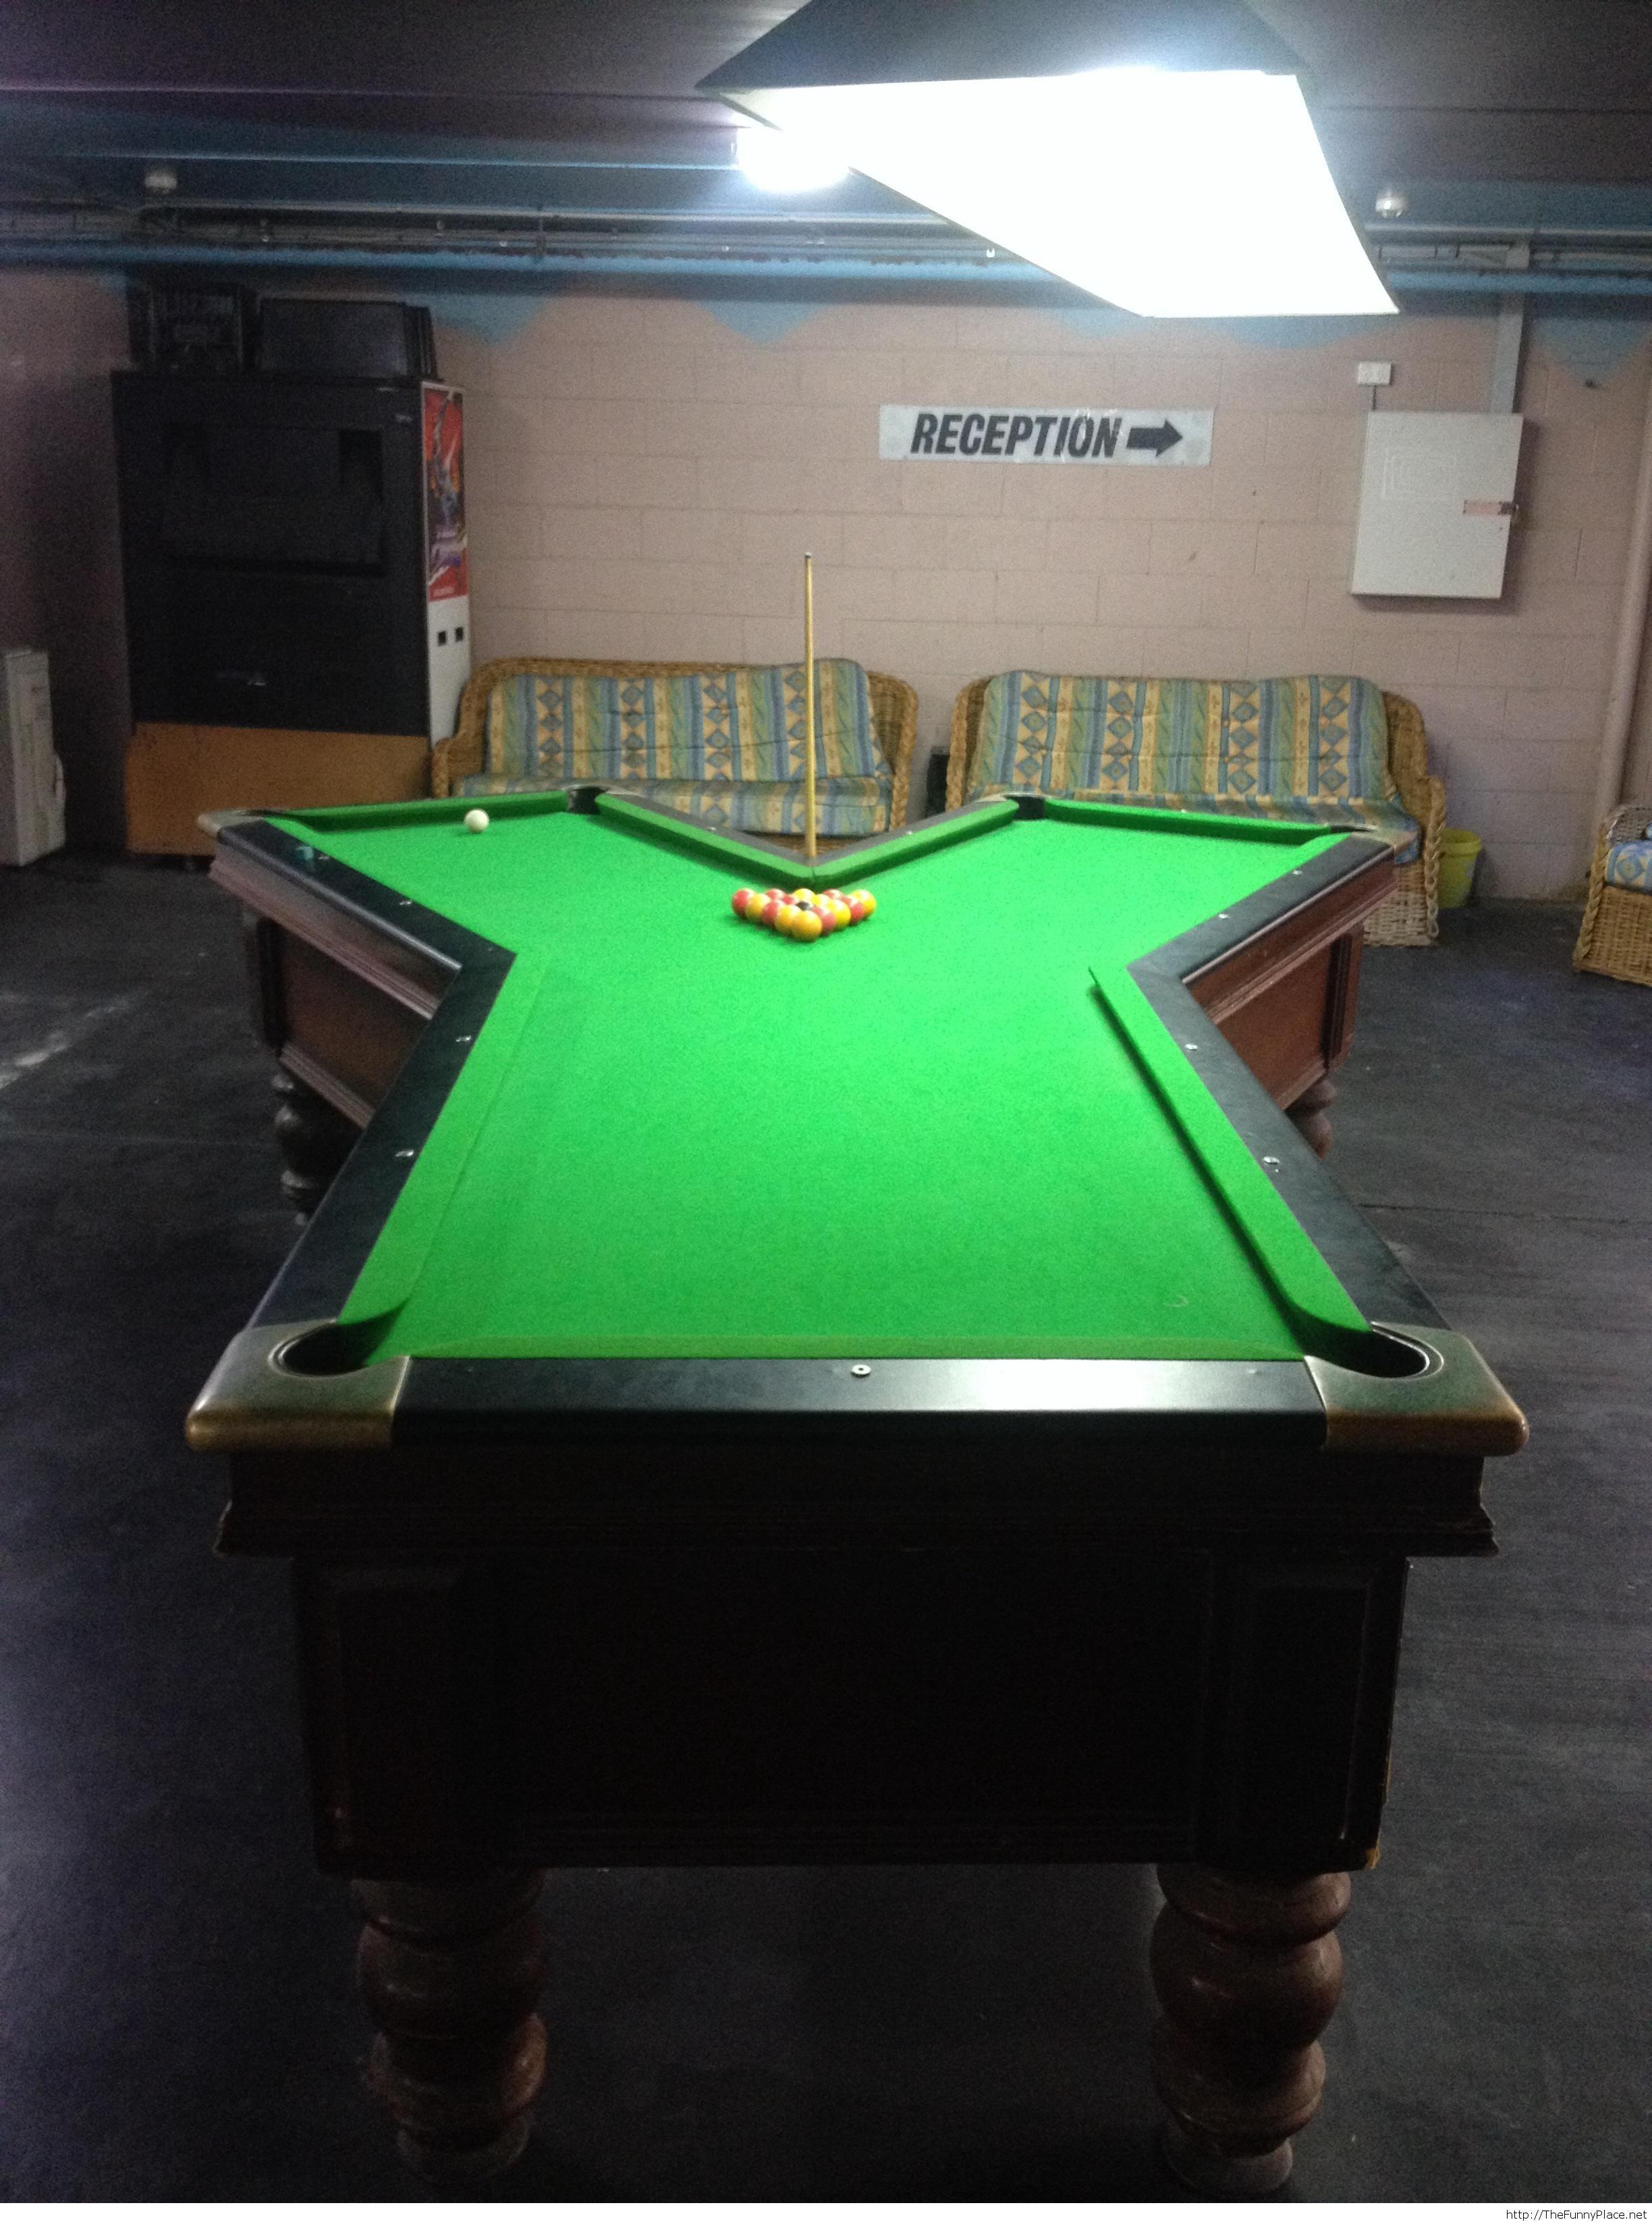 Bizarre shaped Pool Table. billiards pooltable 8ball